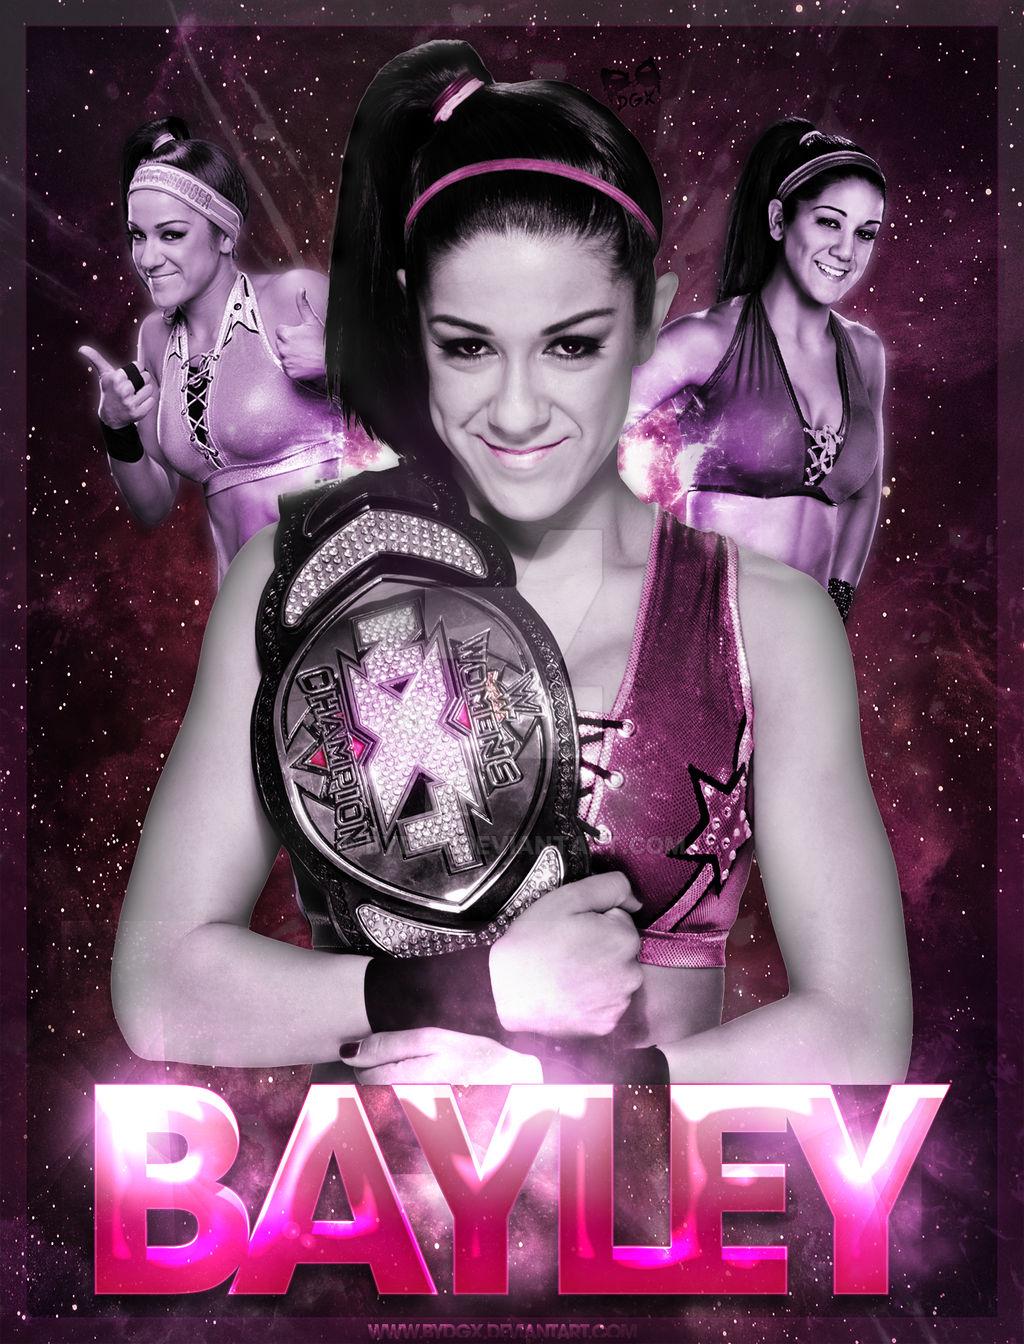 Bayley - Poster